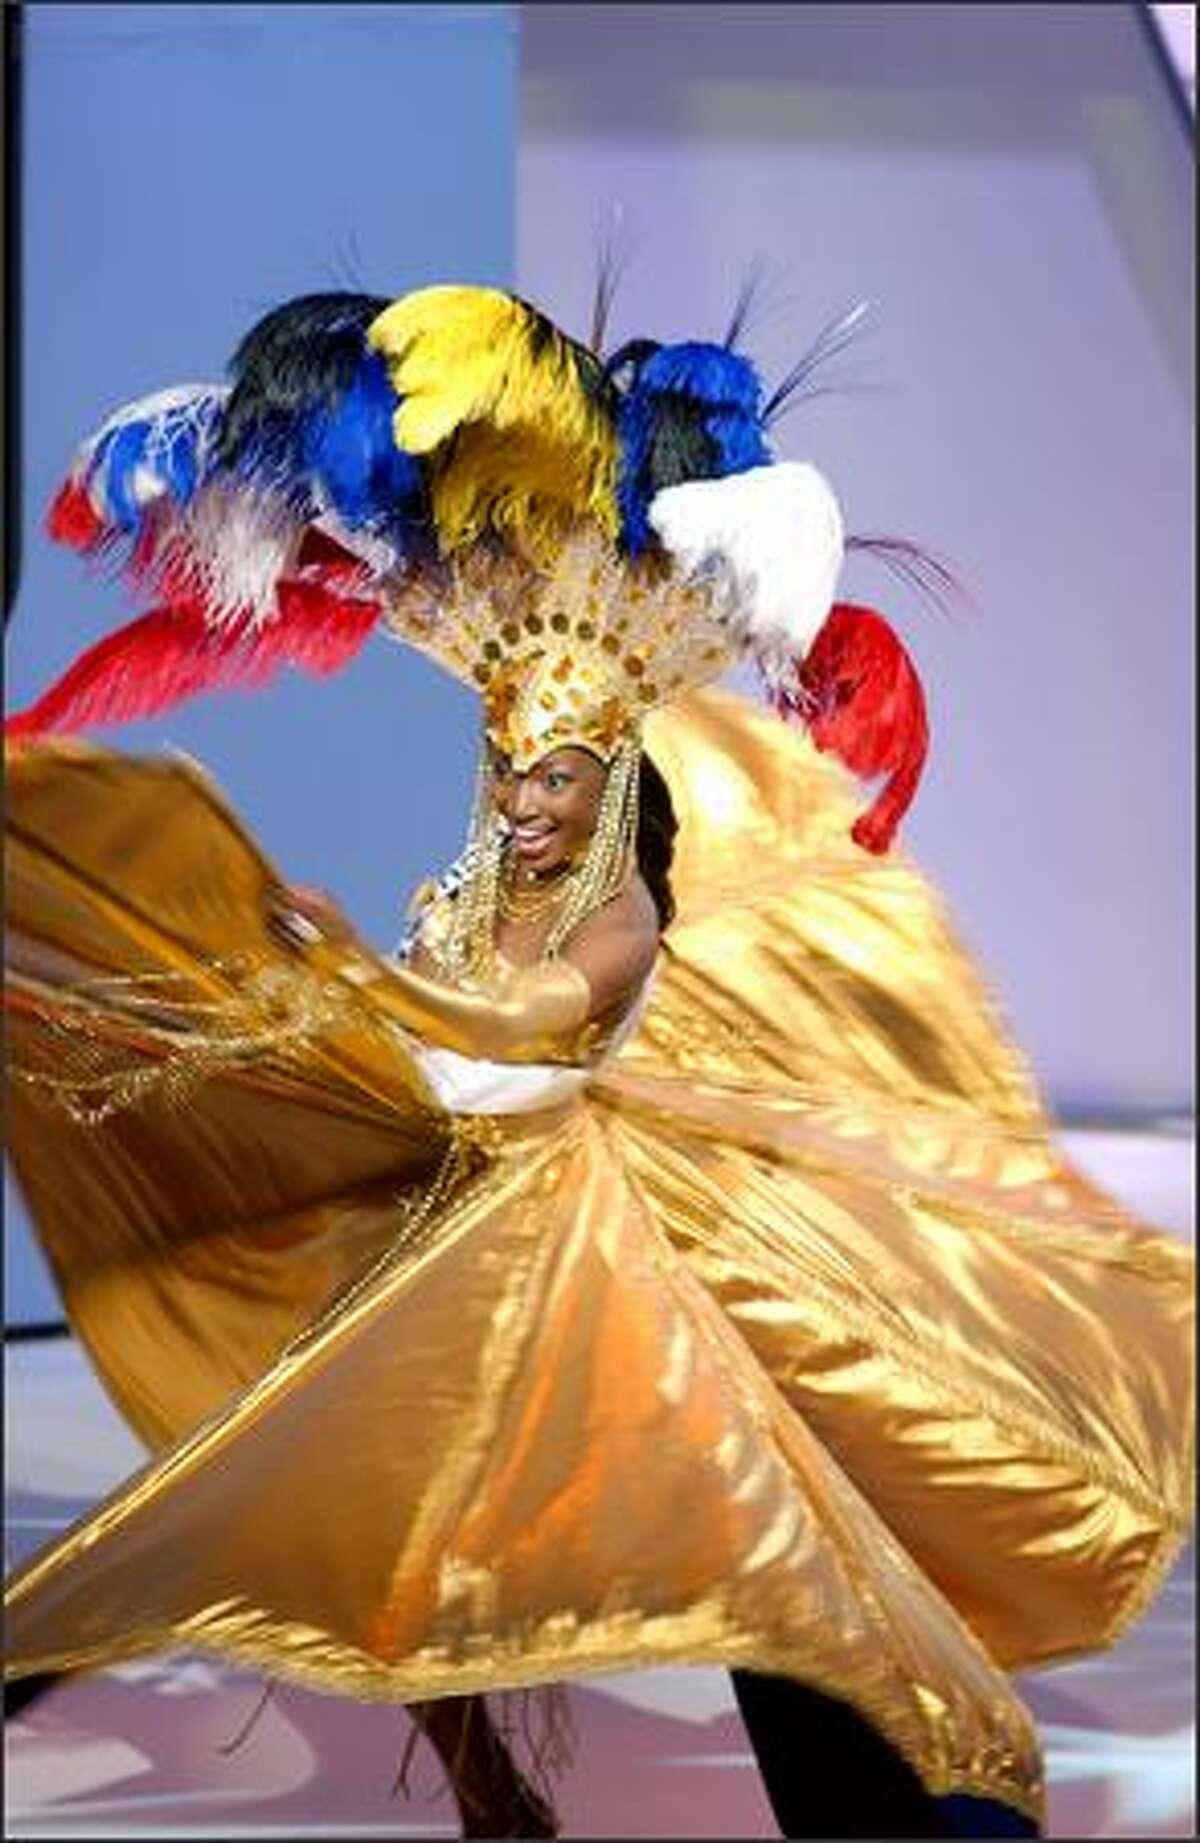 Ann-Marie Browne, Miss Antigua & Barbuda, participates in the 2004 Miss Universe National Costume Show at the Casa de la Cultura in Quito, Ecuador.